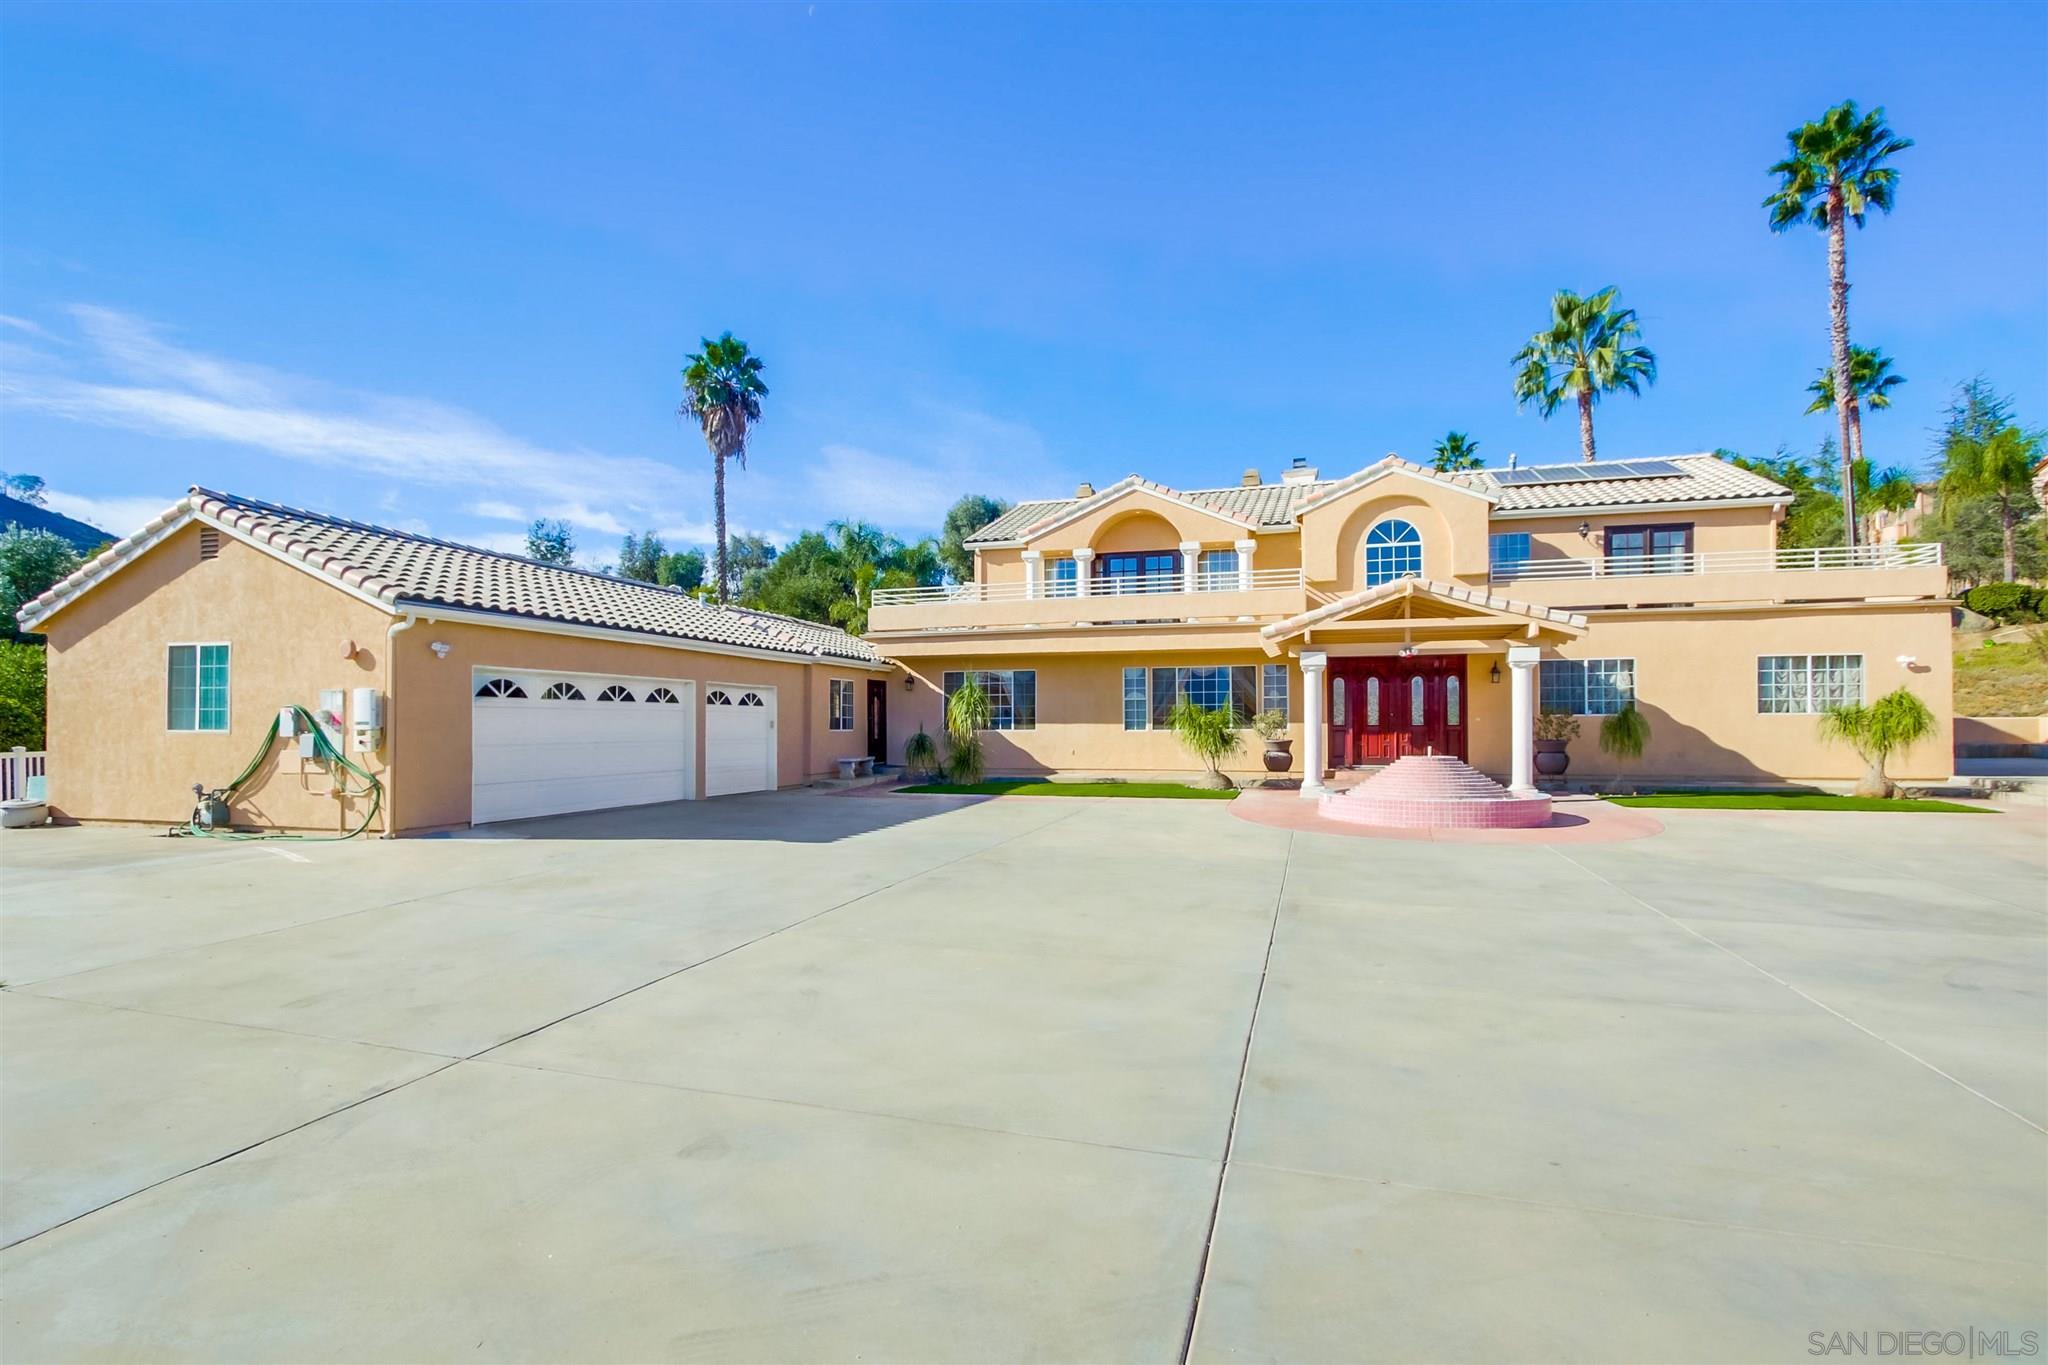 Photo of 1455 Fuerte Heights Ln, El Cajon, CA 92019